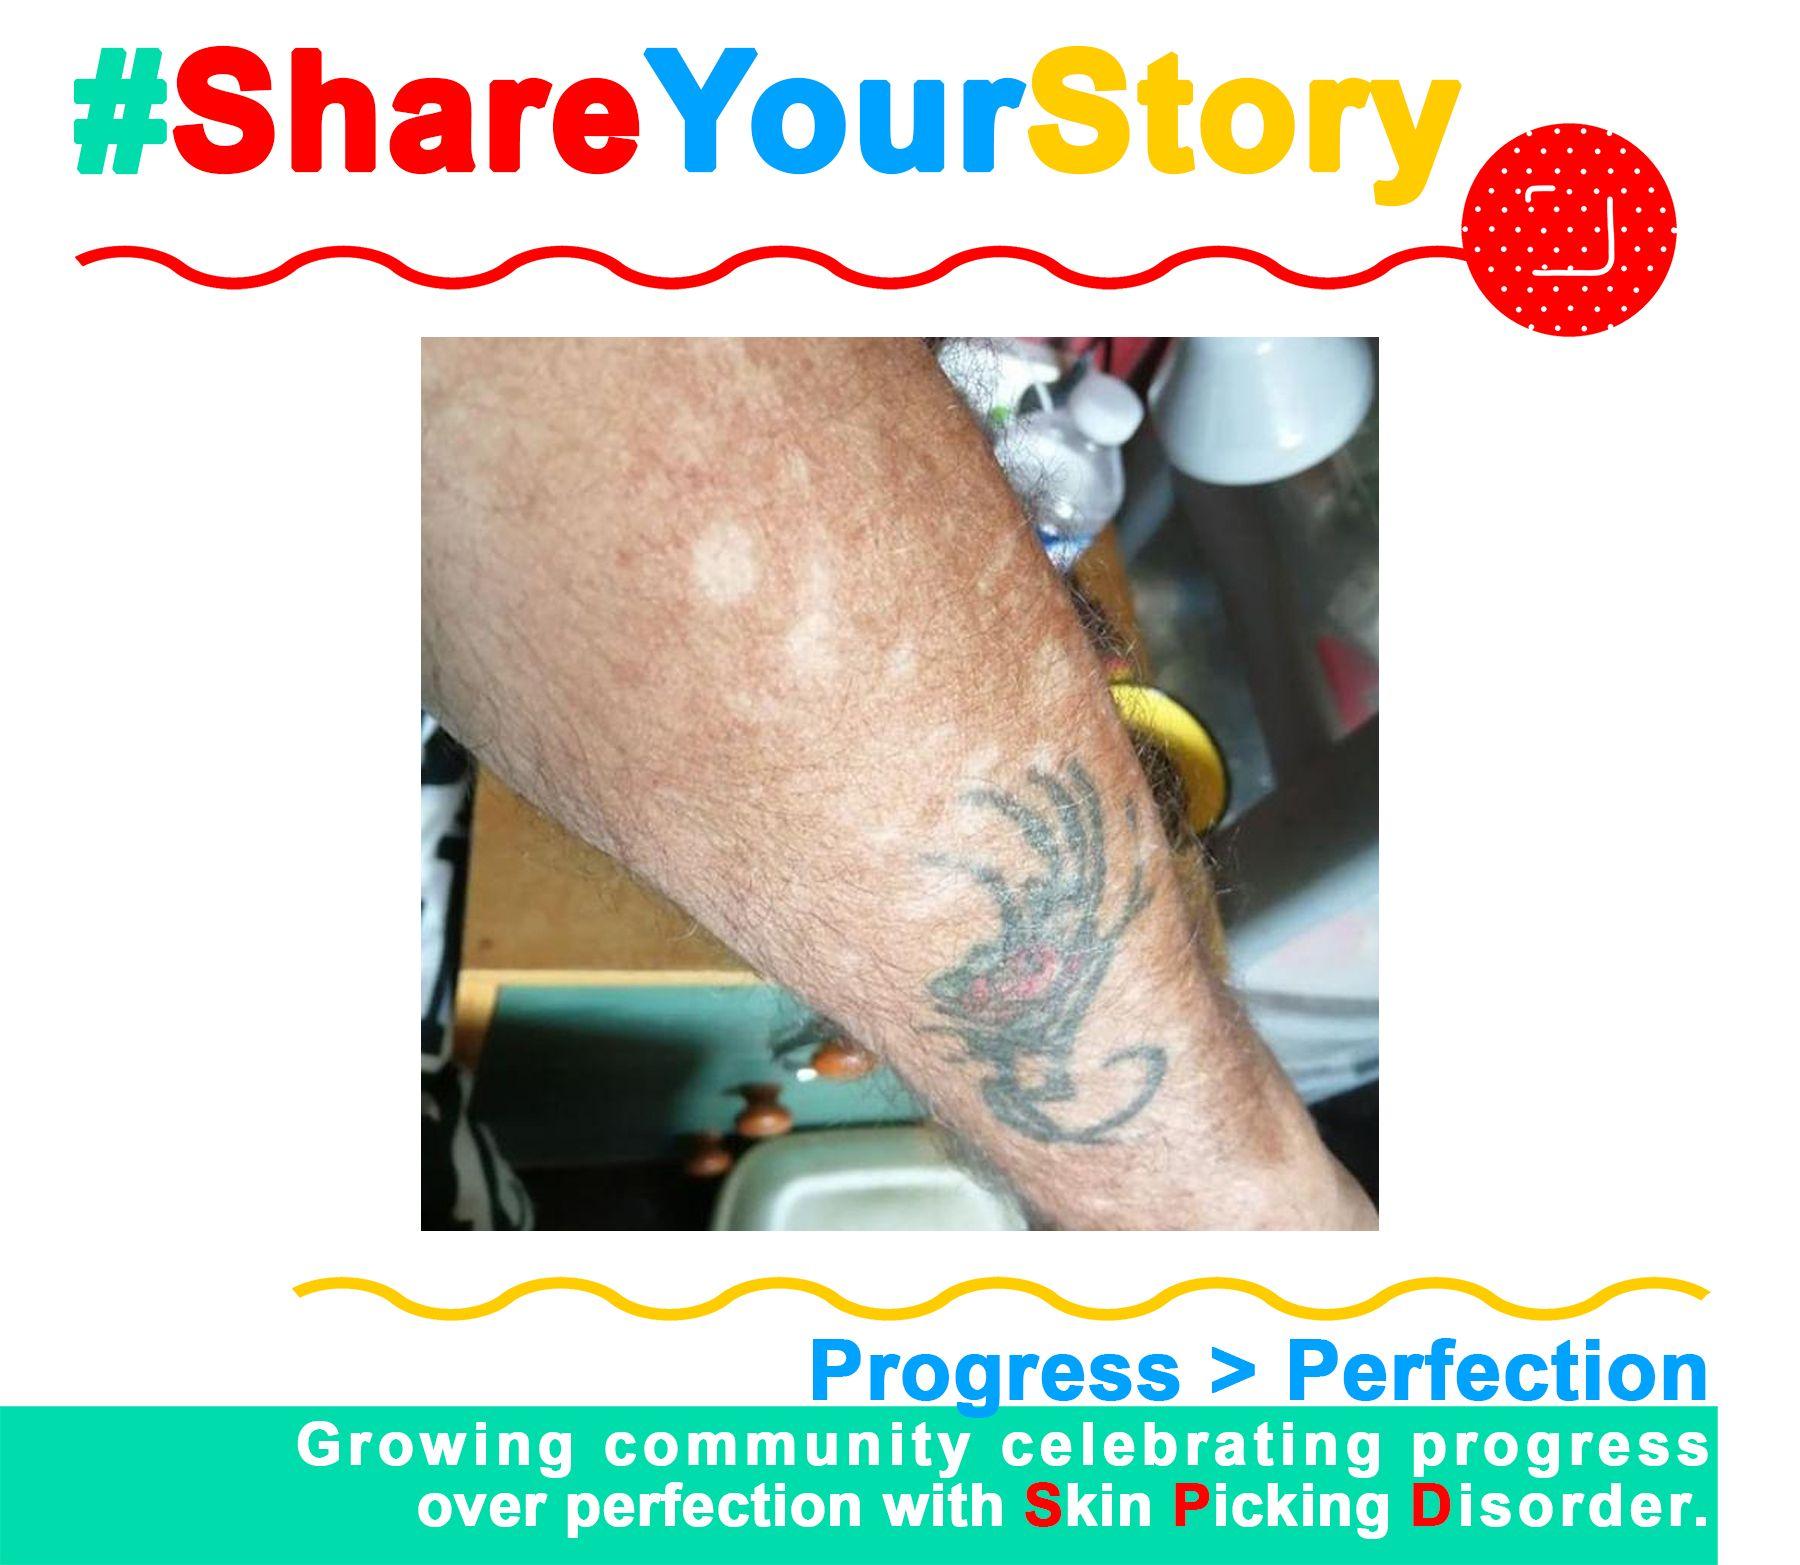 #ShareYourStory: Steve